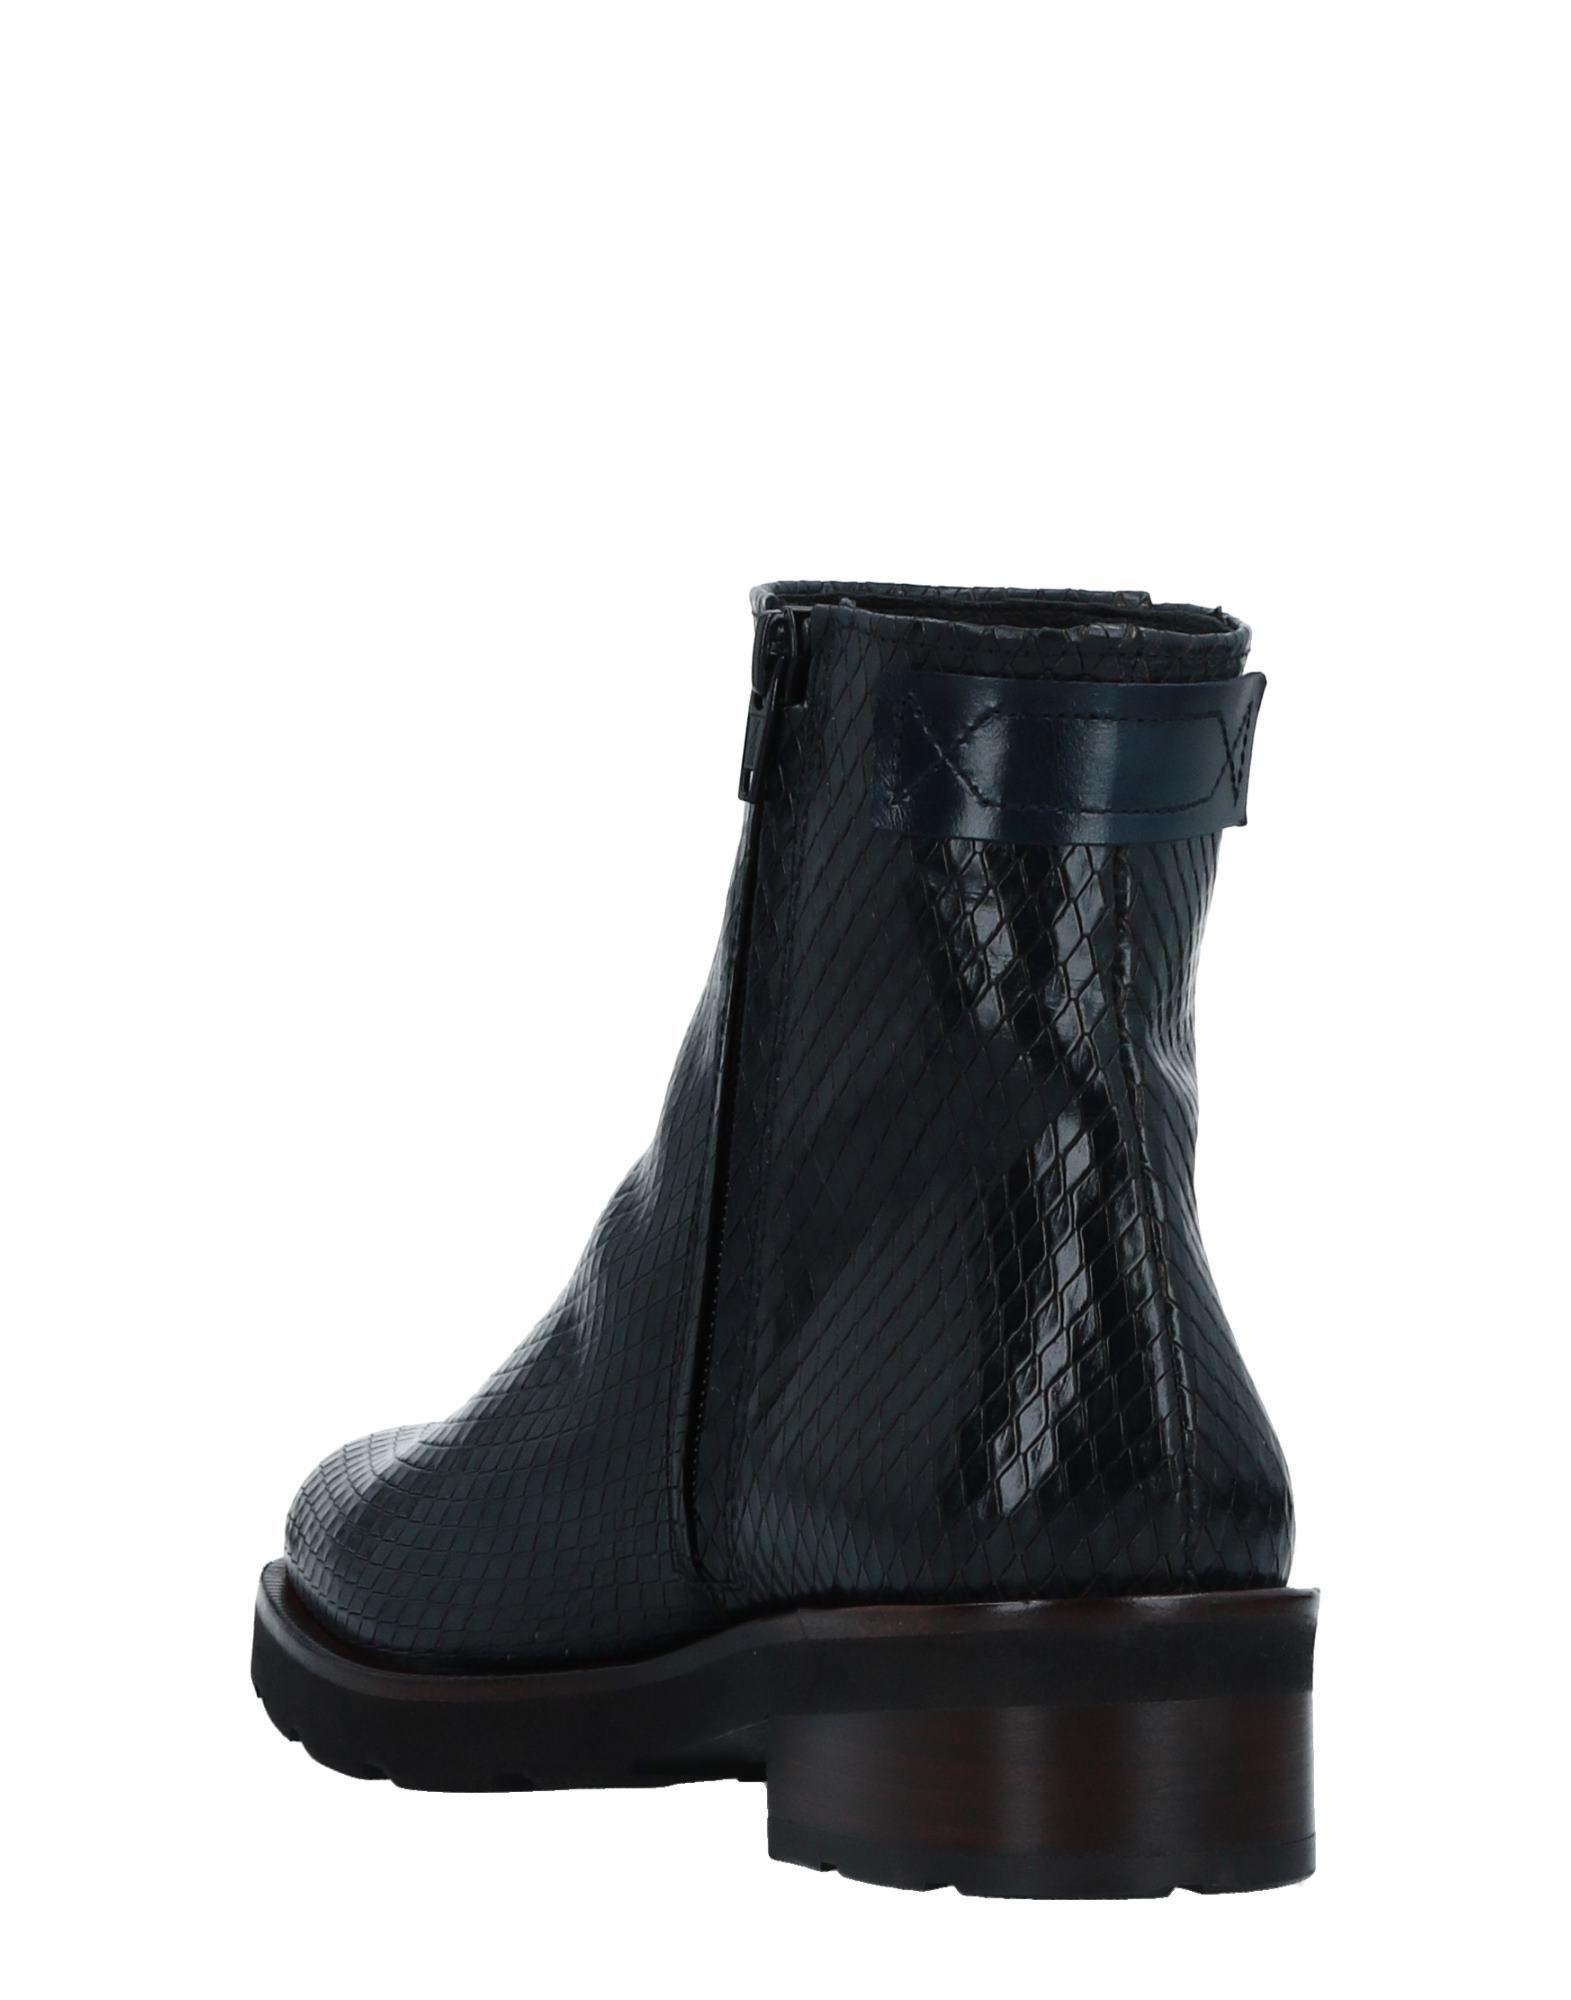 Stilvolle billige Schuhe Damen Zinda Stiefelette Damen Schuhe  11517918AR 2e5a64